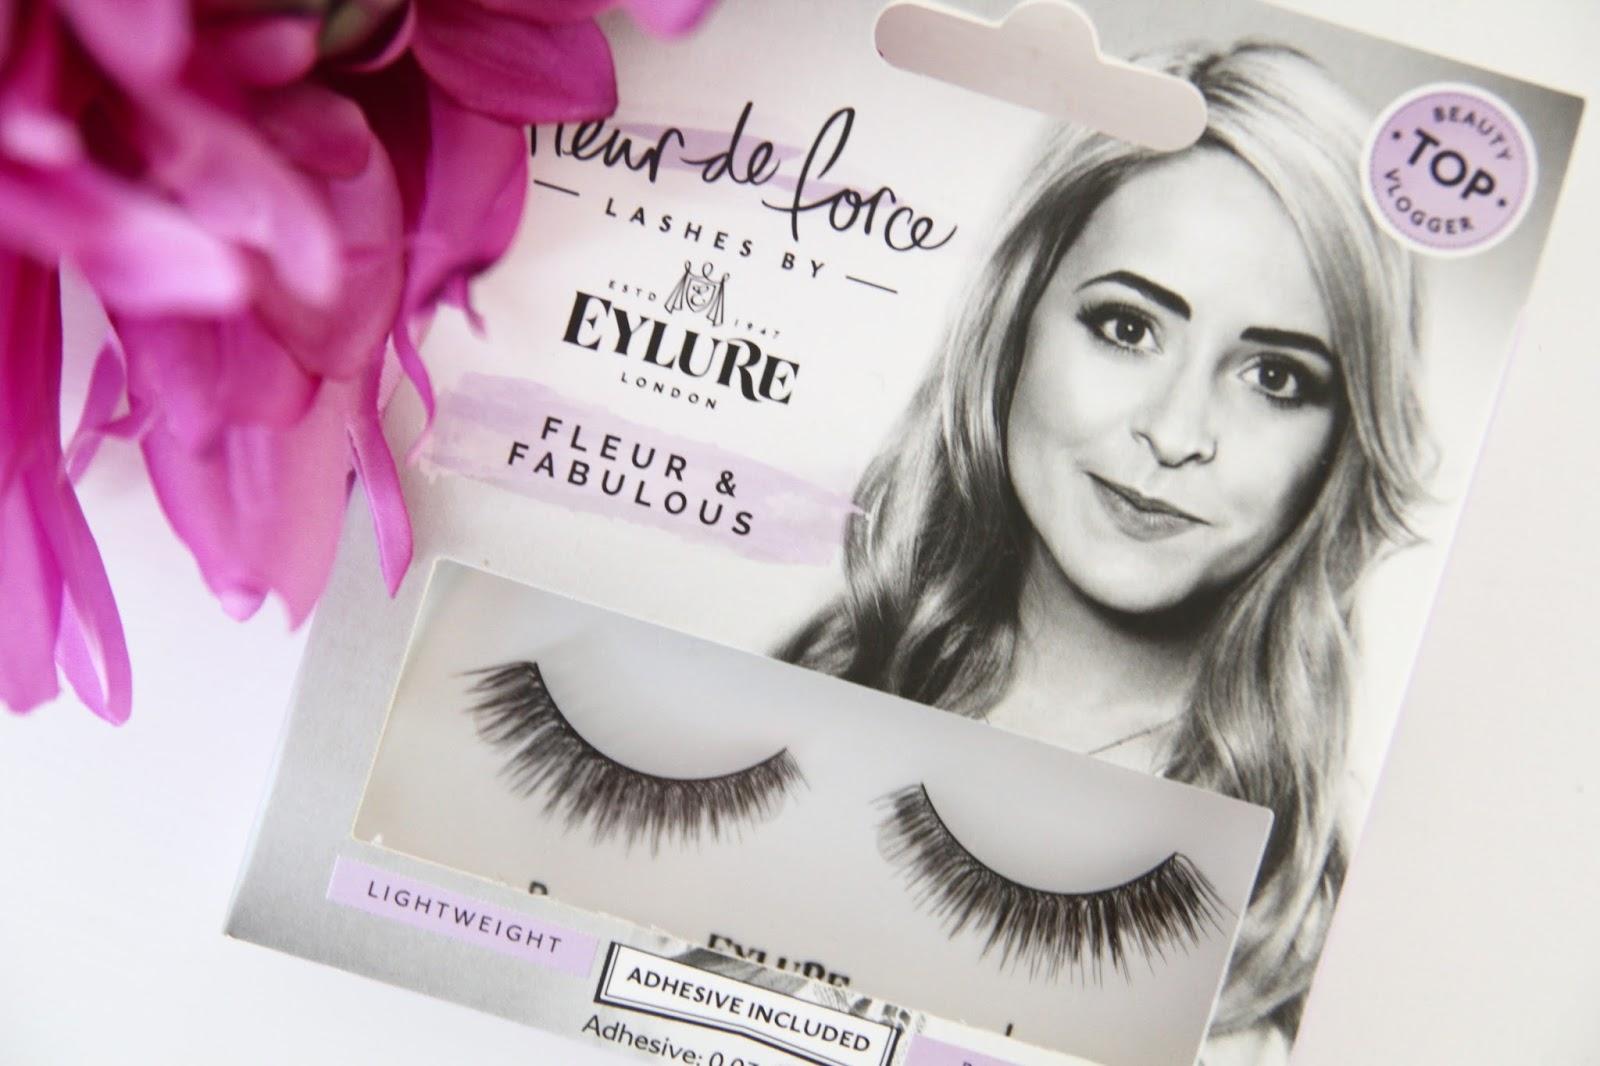 Fleurdeforce For Eylure My New Collection Fleur De Force